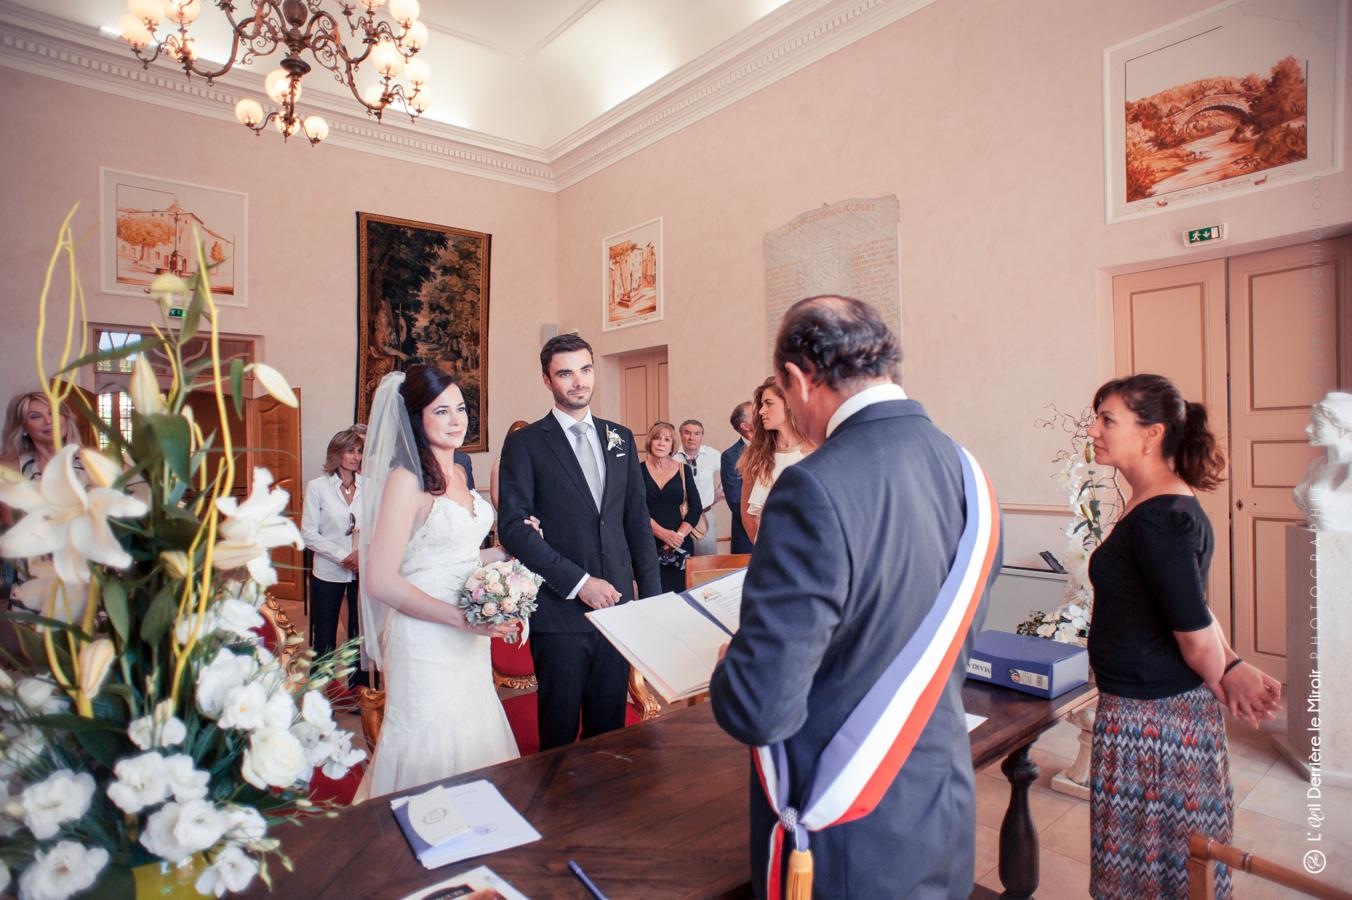 Photographe-mariage-Lorgues-83-KS-034